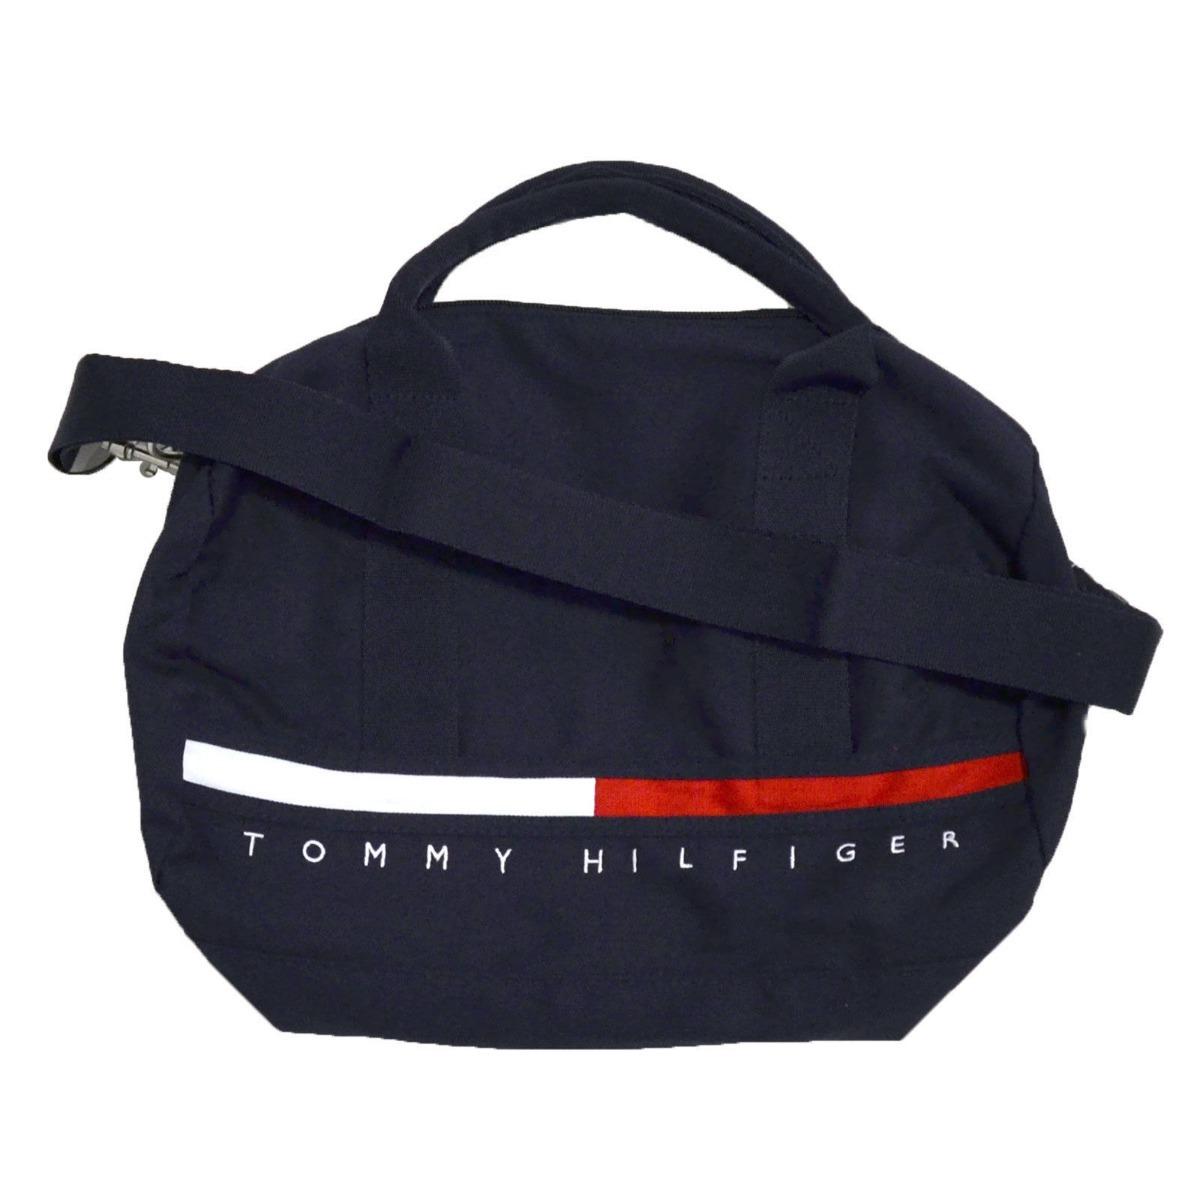 ad7494bef bolsa sacola tommy hilfiger pequena mini original (logo). Carregando zoom.